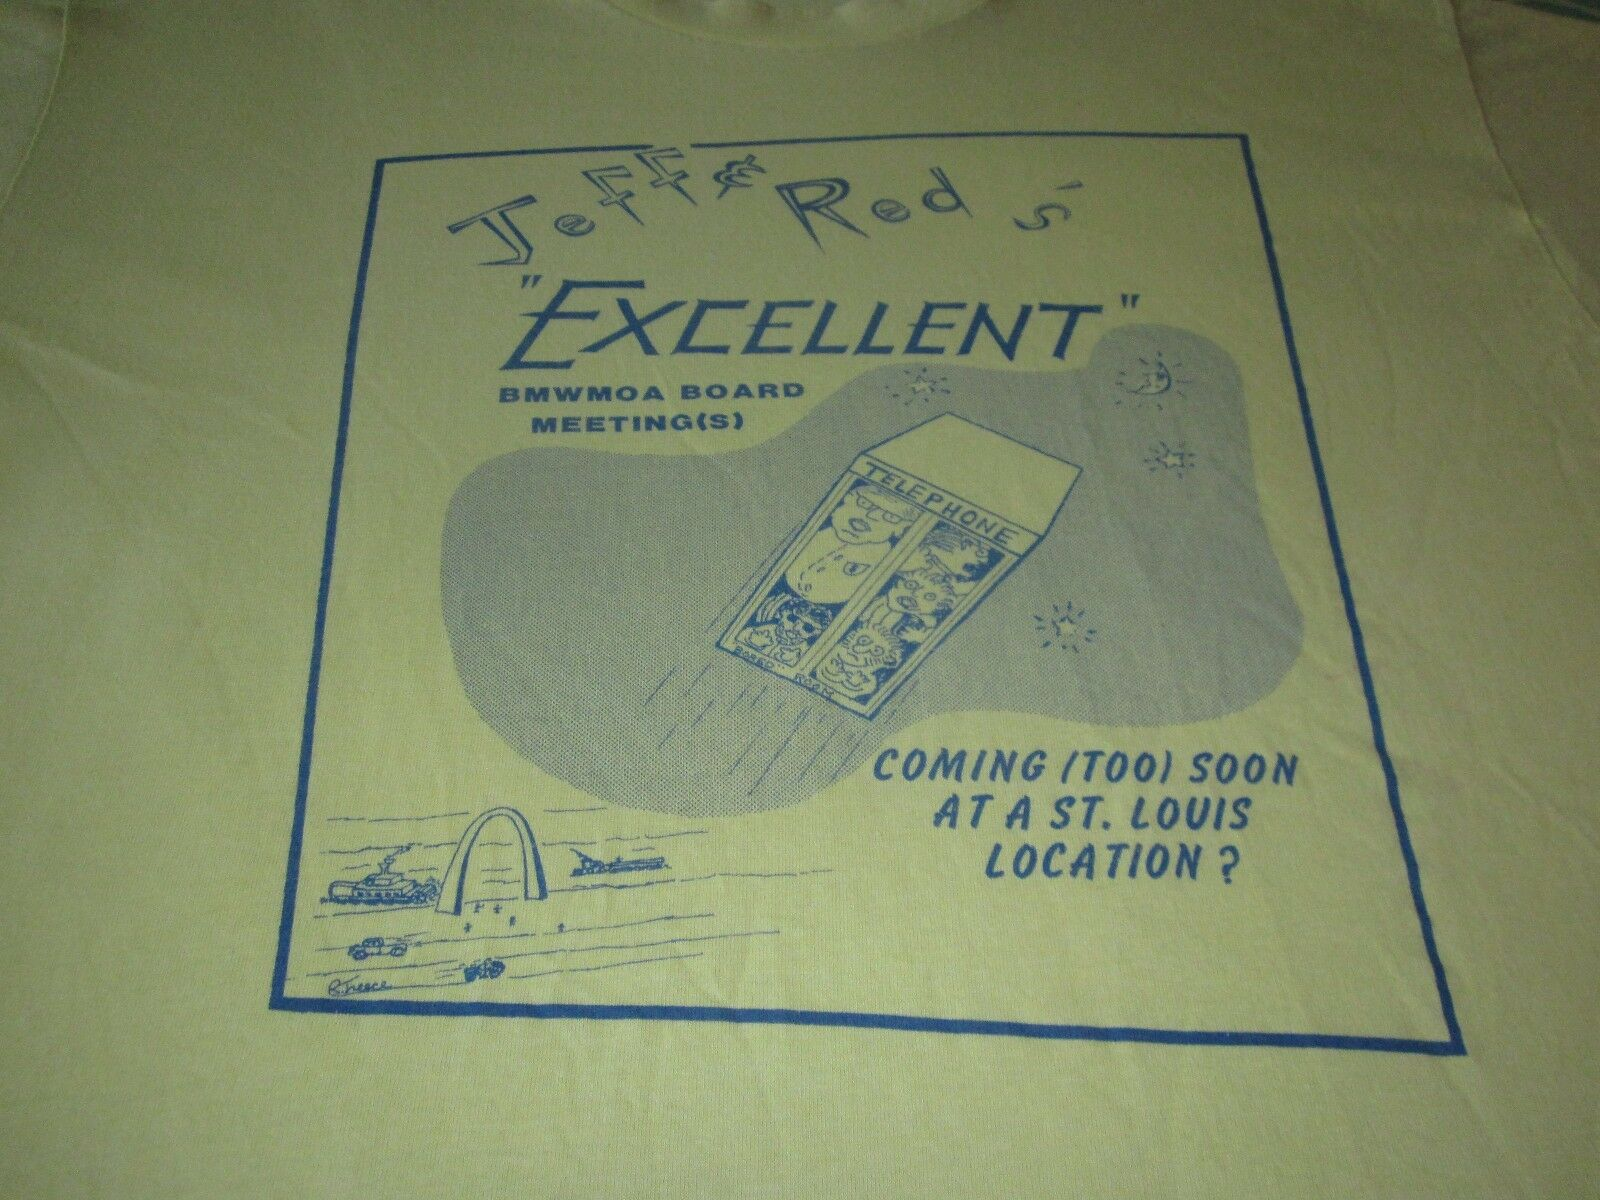 JEFF & ROTS EXCELLENT ADVENTURE VINTAGE 80S TEE SHIRT XL